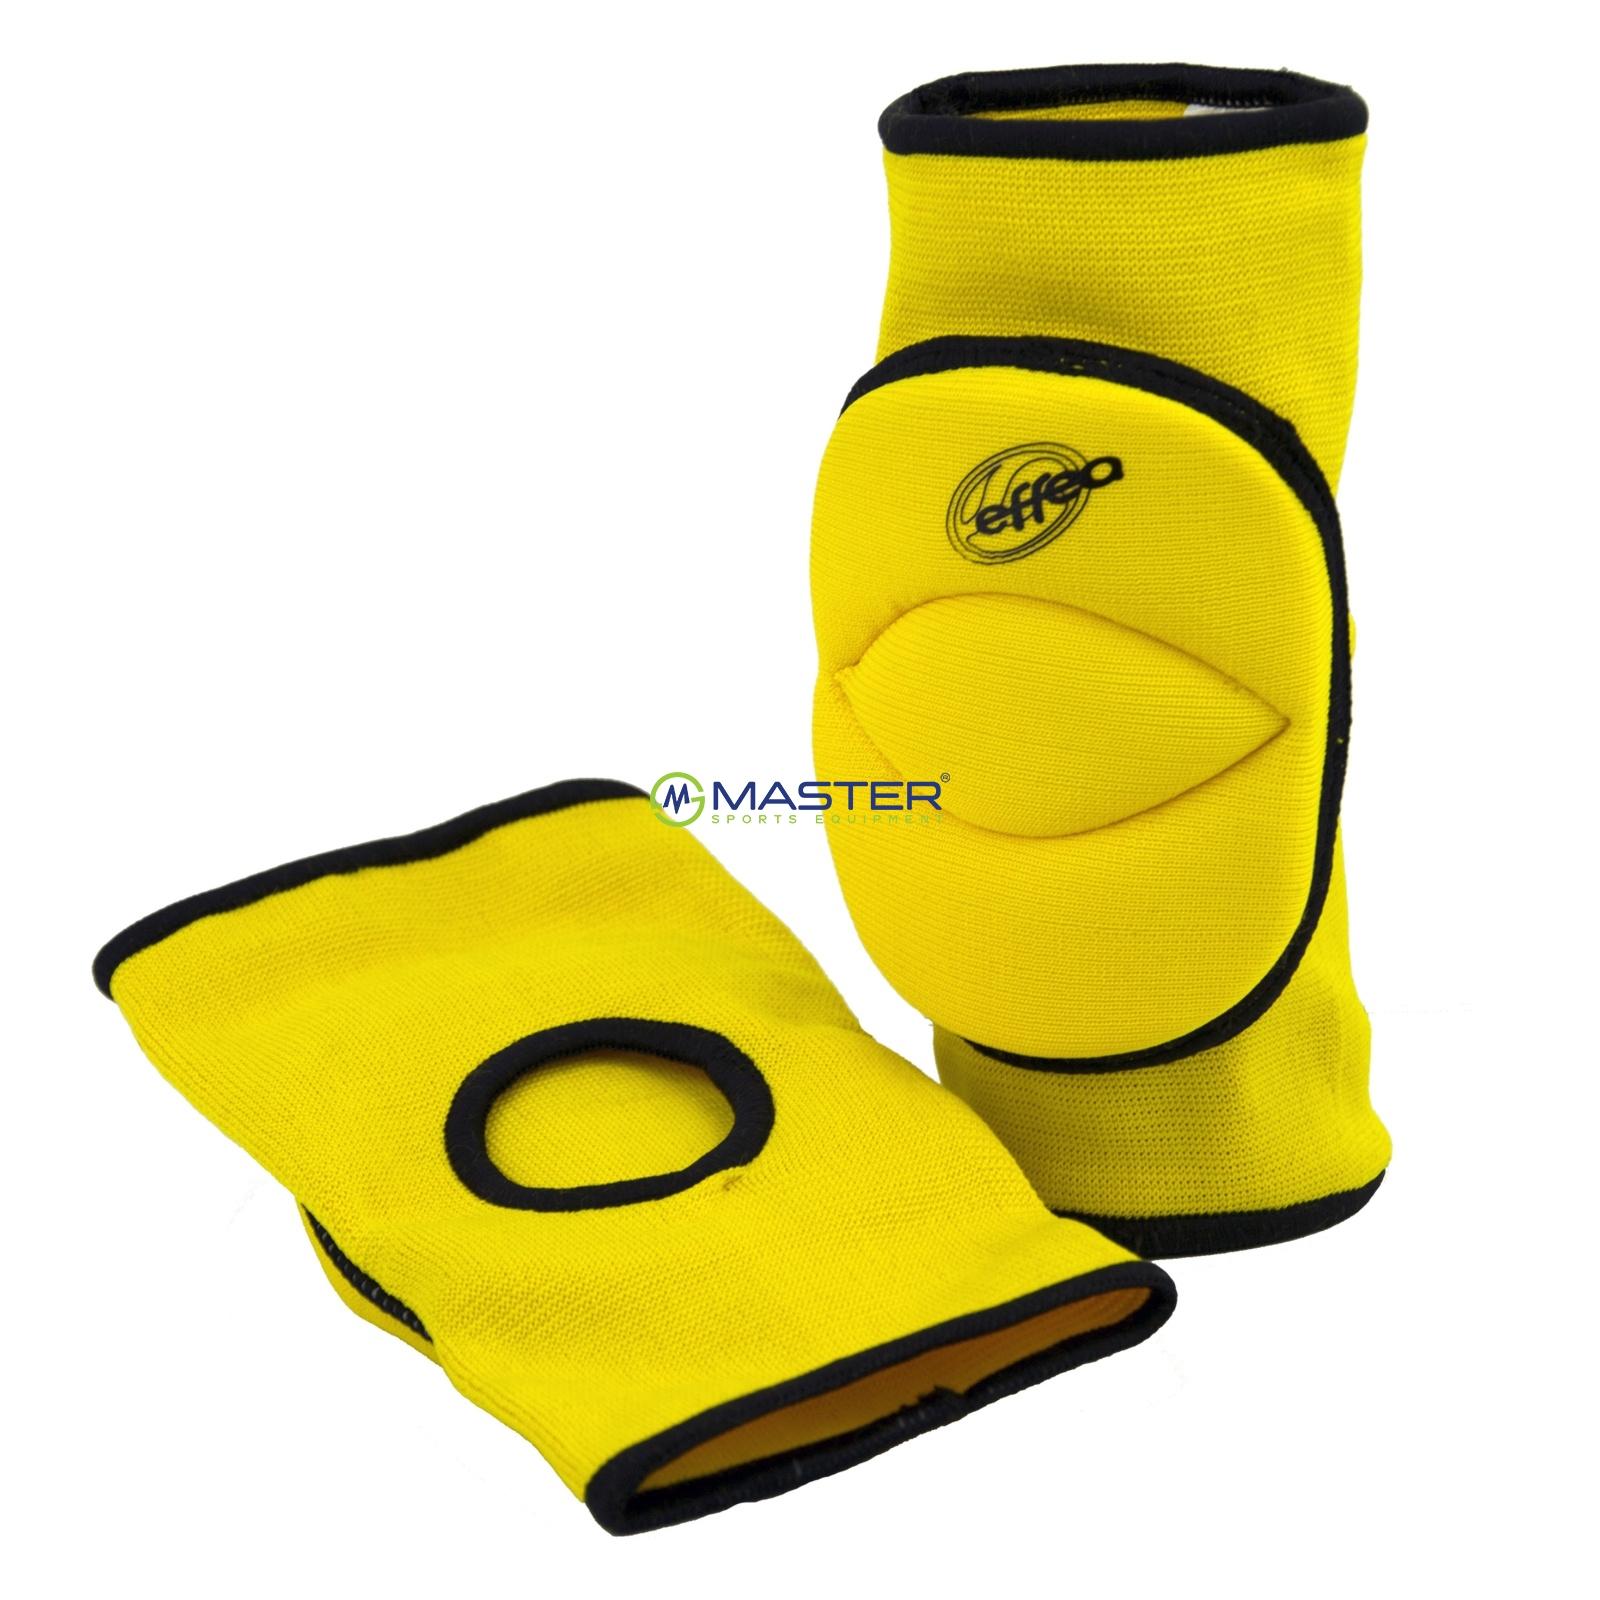 Volejbalové chrániče kolen EFFEA 6644 junior žluté  37dabfe720